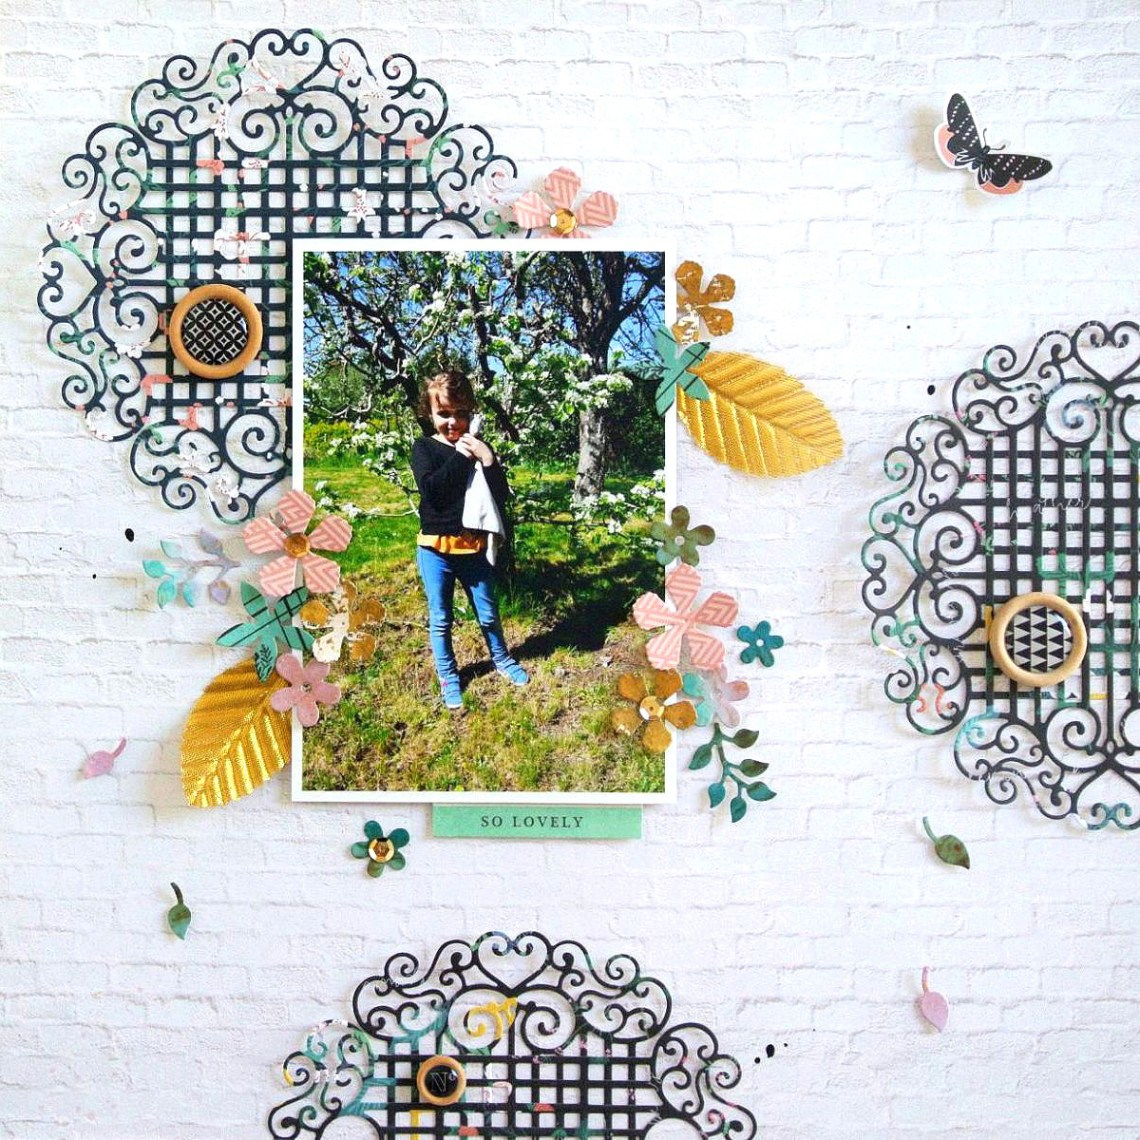 Spellbinders - Blooming Garden Collection by Marisa Job - Inspiration | Feminine Layout with Elodie S3-335 Rose Buds, S4-917 Swirl Lattice Panel, S6-147 Hexagon Petal Box #spellbinders #diecutting #scrapbooking #neverstopmaking